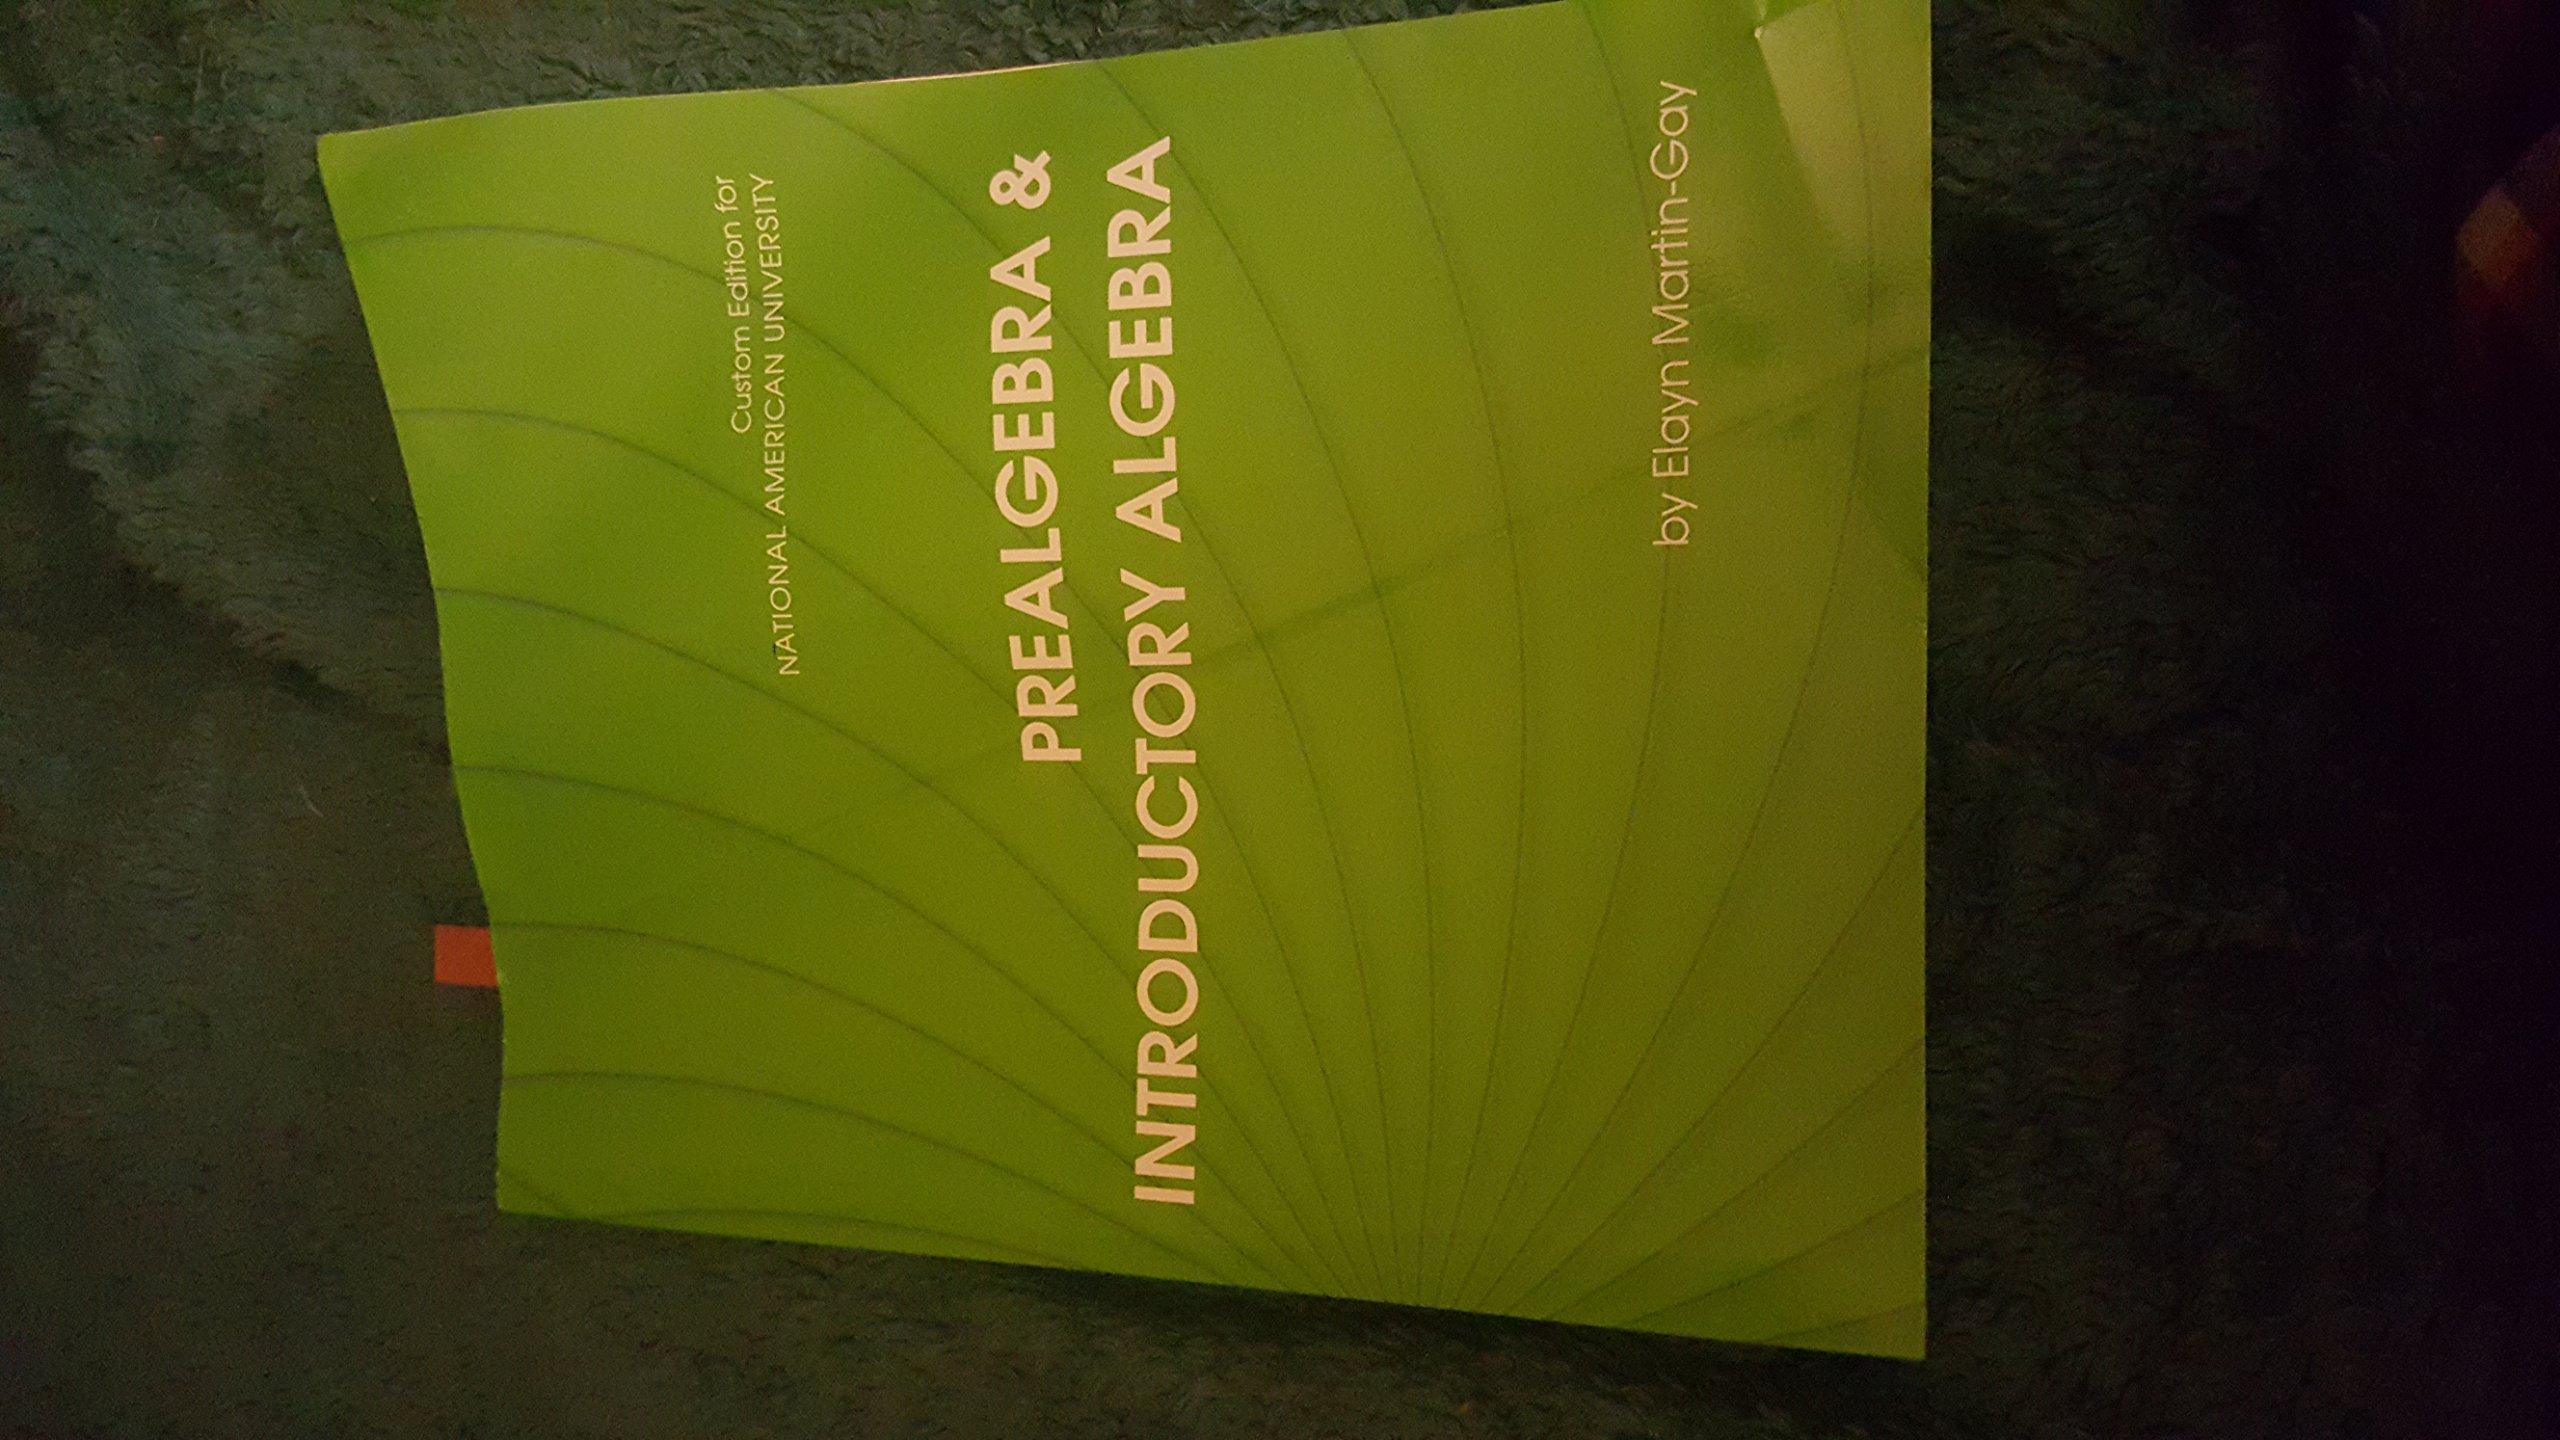 Prealgebra & Introductory Algebra National American University Custom  Edition (Prealgebra & Introductory Algebra National American University  Custom ...